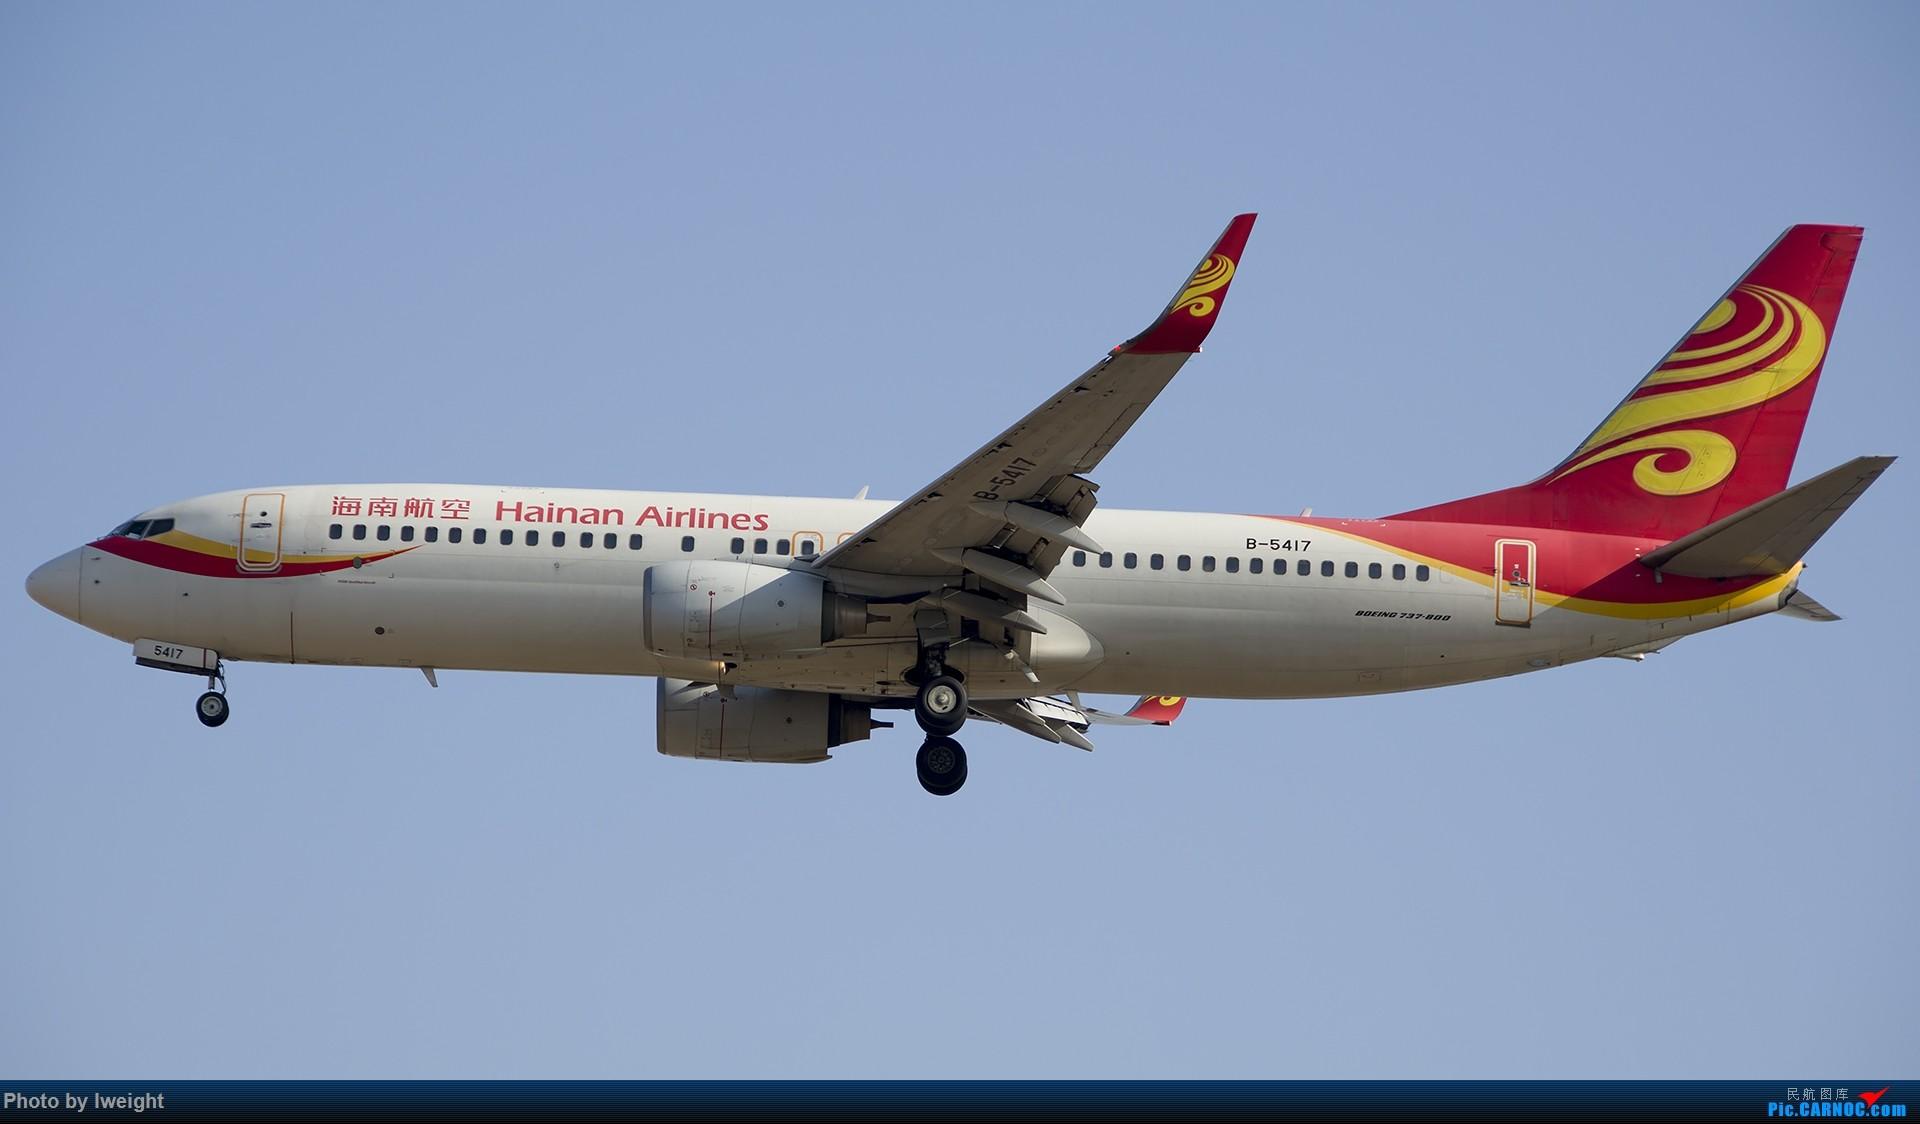 Re:[原创]庆祝升级777,发上今天在首都机场拍的所有飞机【2014-12-14】 BOEING 737-800 B-5417 中国北京首都国际机场